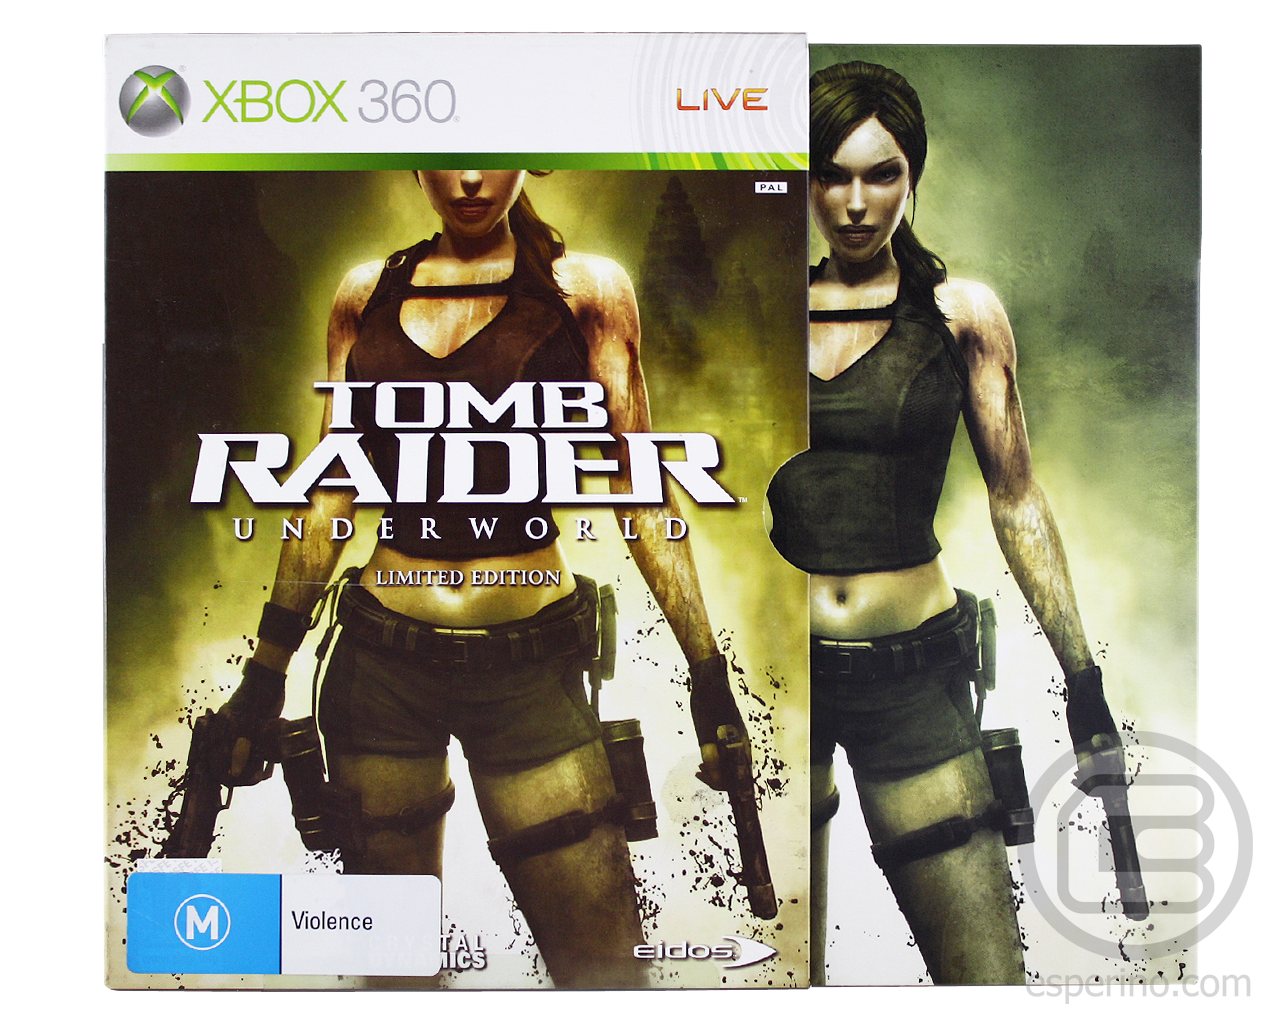 Tomb Raider Underworld Limited Edition Unboxing